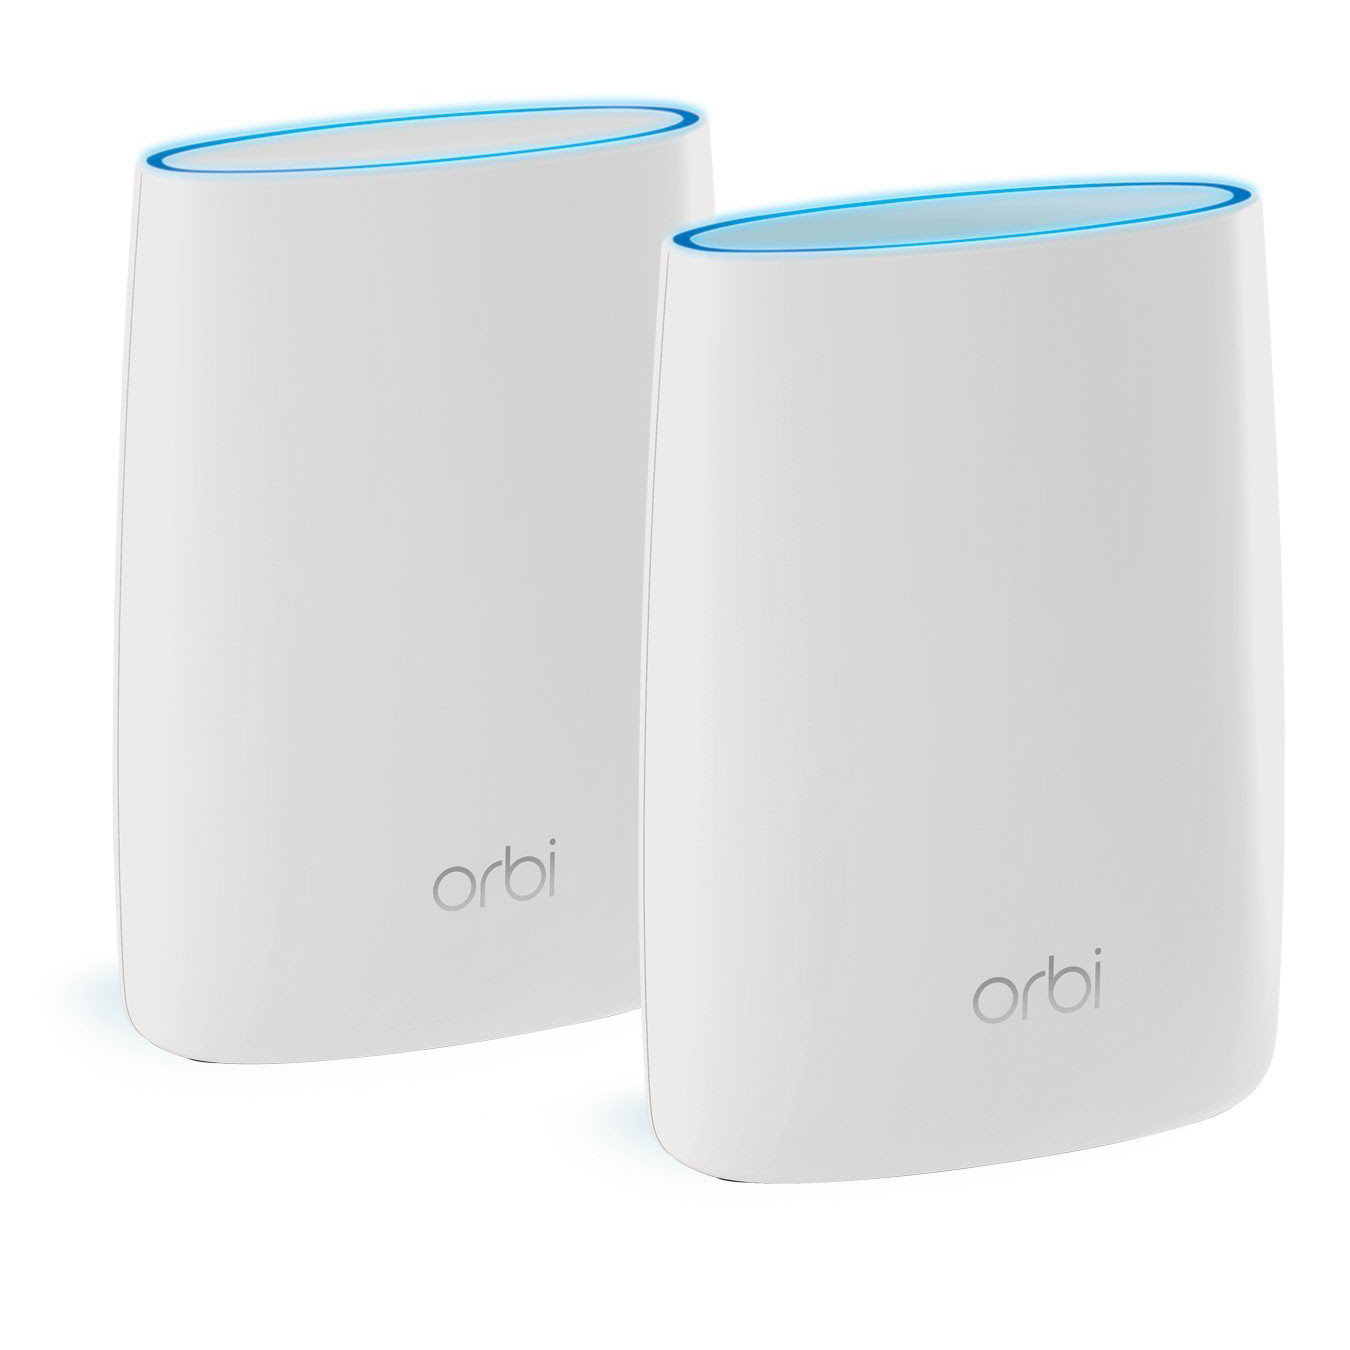 Orbi Système Wifi RBK50-100PES - AC3000 - Cybertek.fr - 0